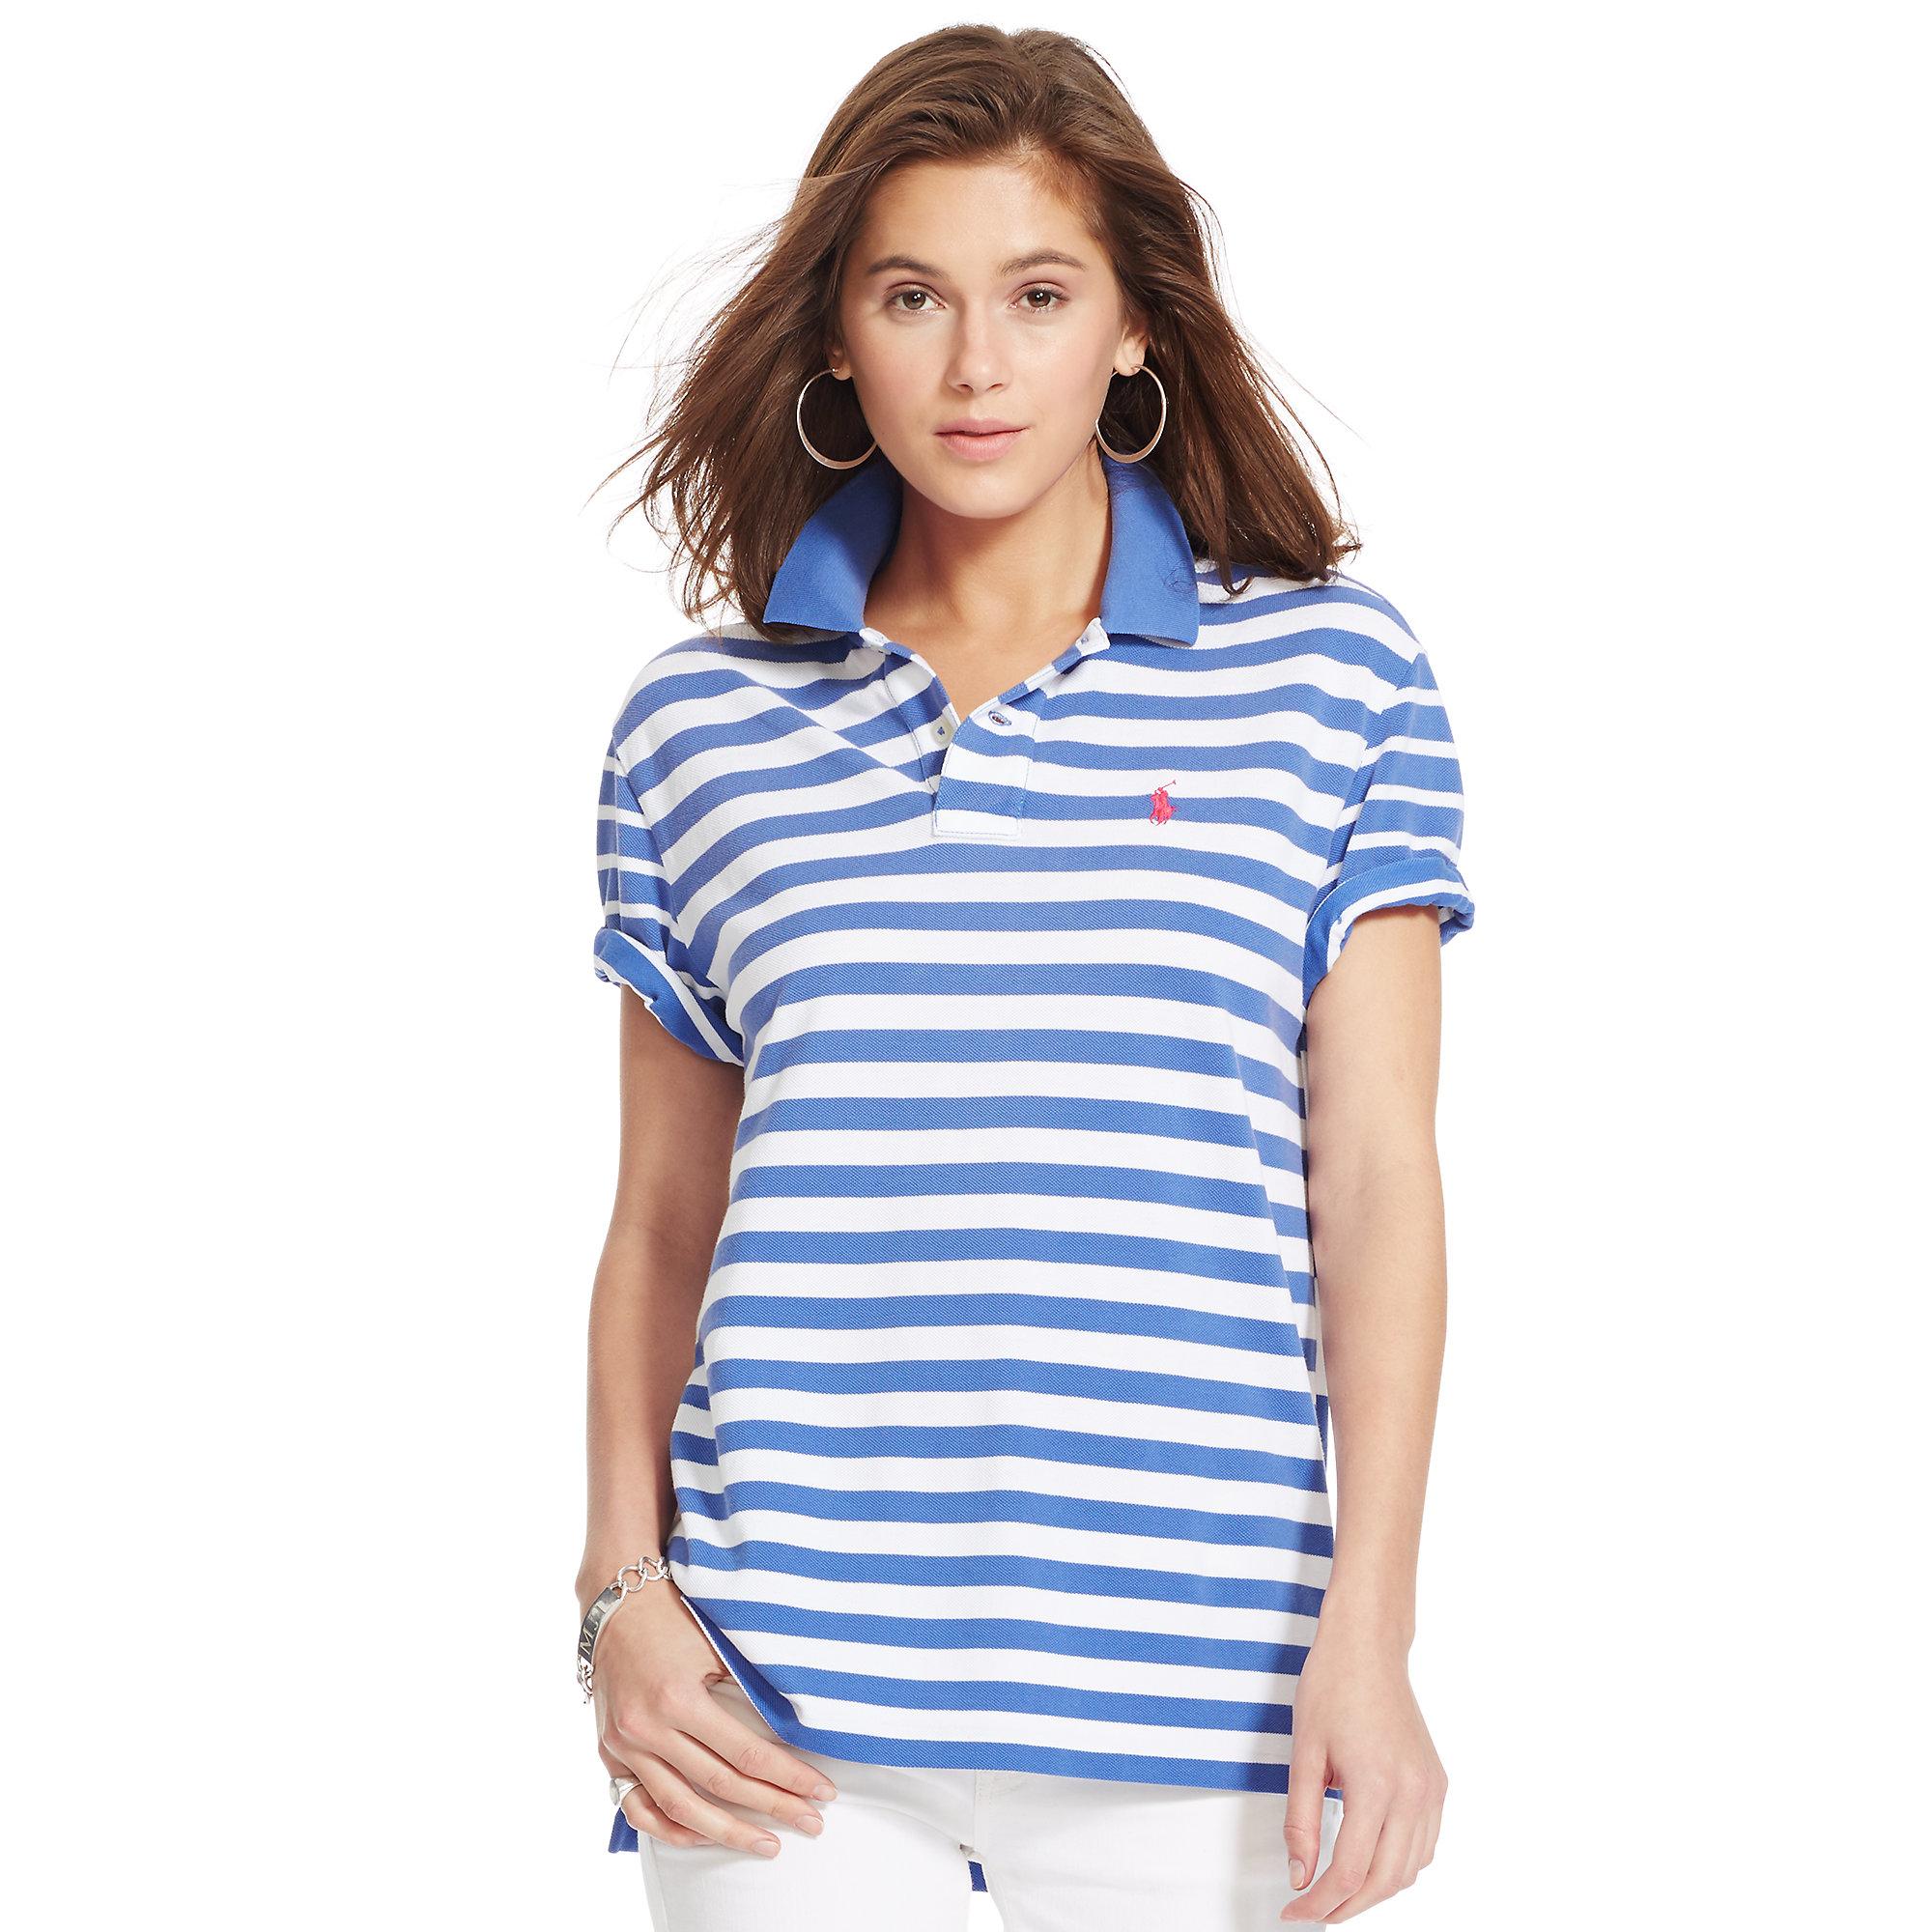 7a016439c2ab Lyst - Polo Ralph Lauren Contrast-stripe Boyfriend Polo in Blue